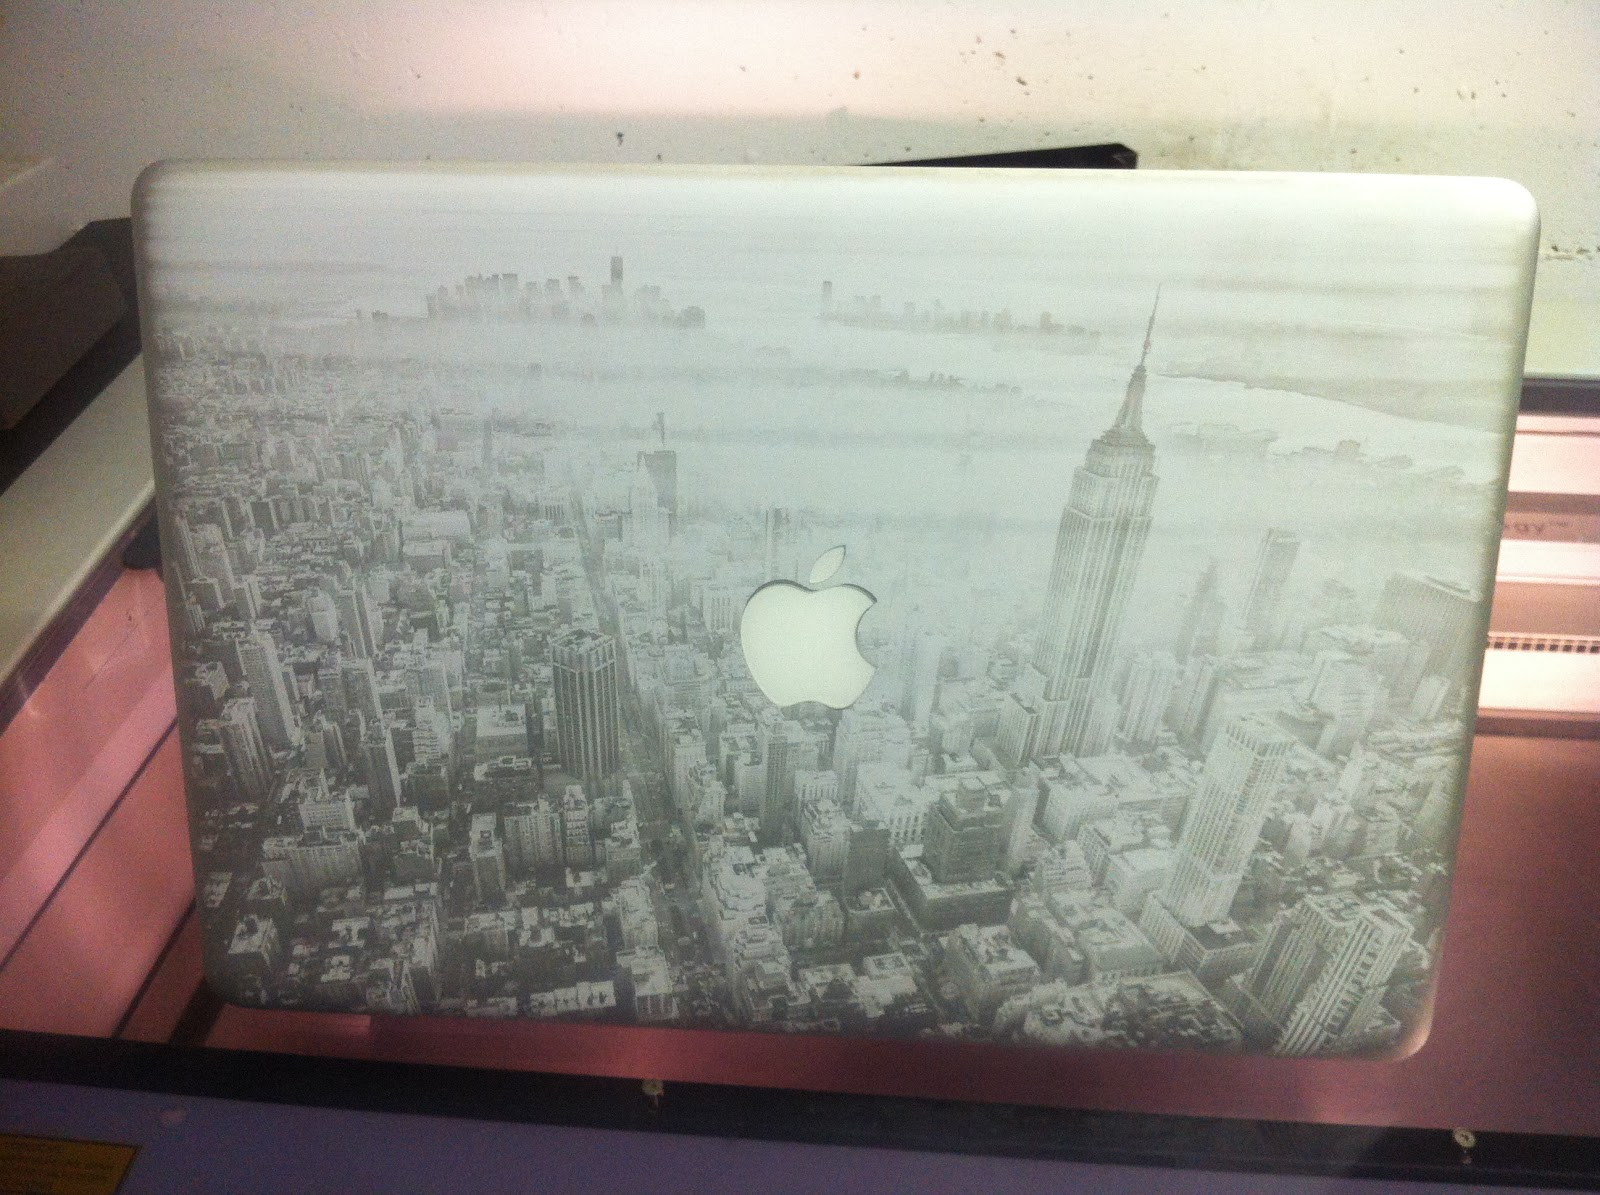 lasergravur auf apple macbook pro exklusive. Black Bedroom Furniture Sets. Home Design Ideas